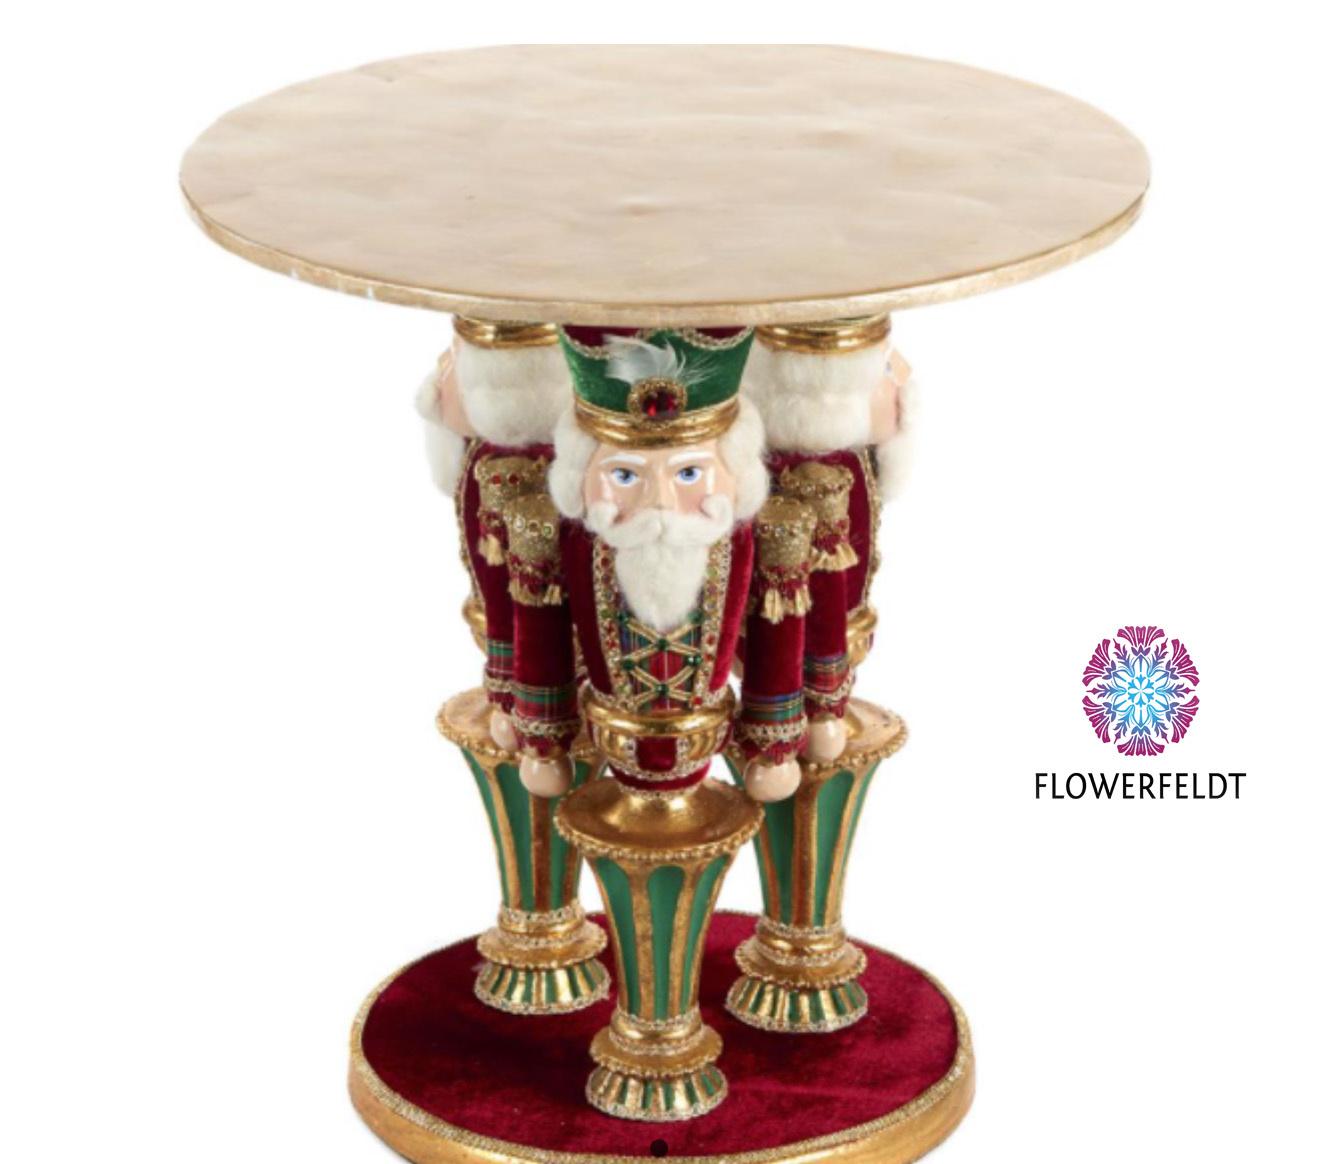 Goodwill Nutcracker cake stand - H30,5 cm